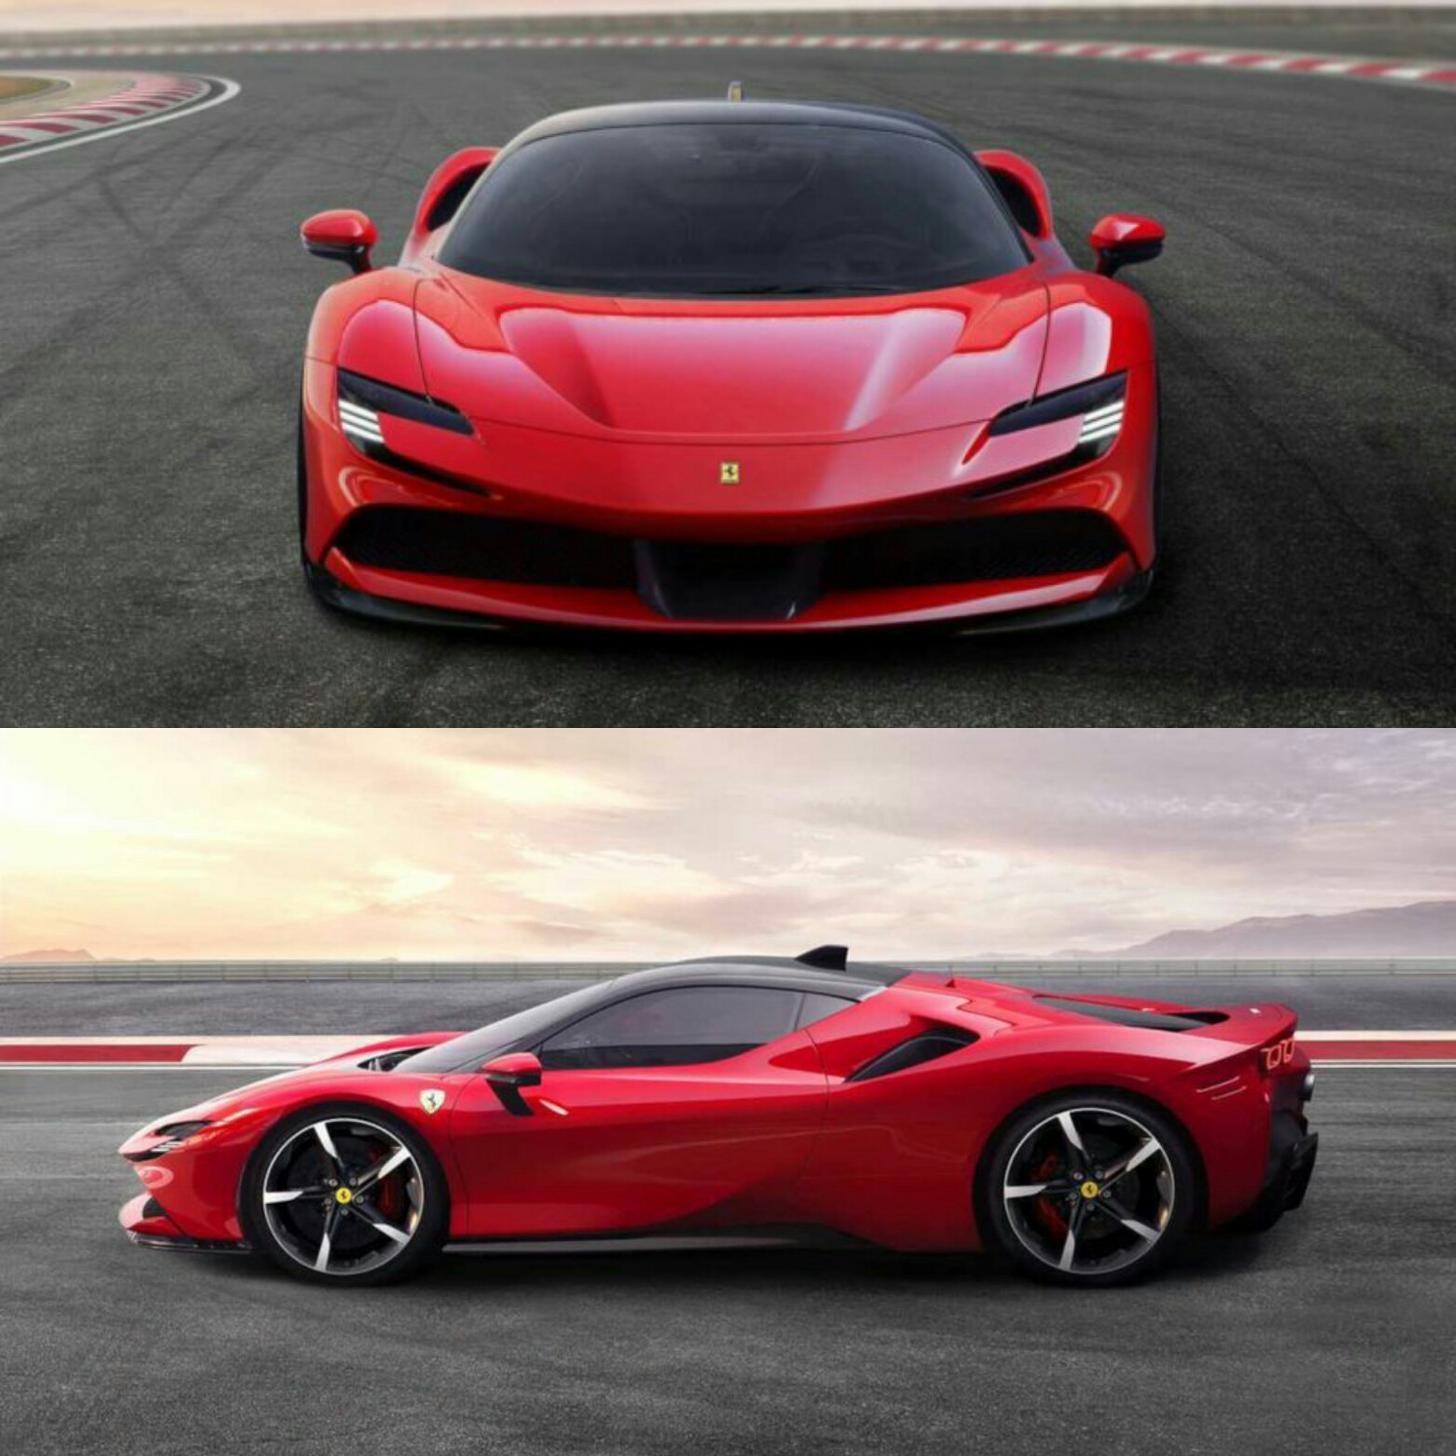 Ferrari Supercar